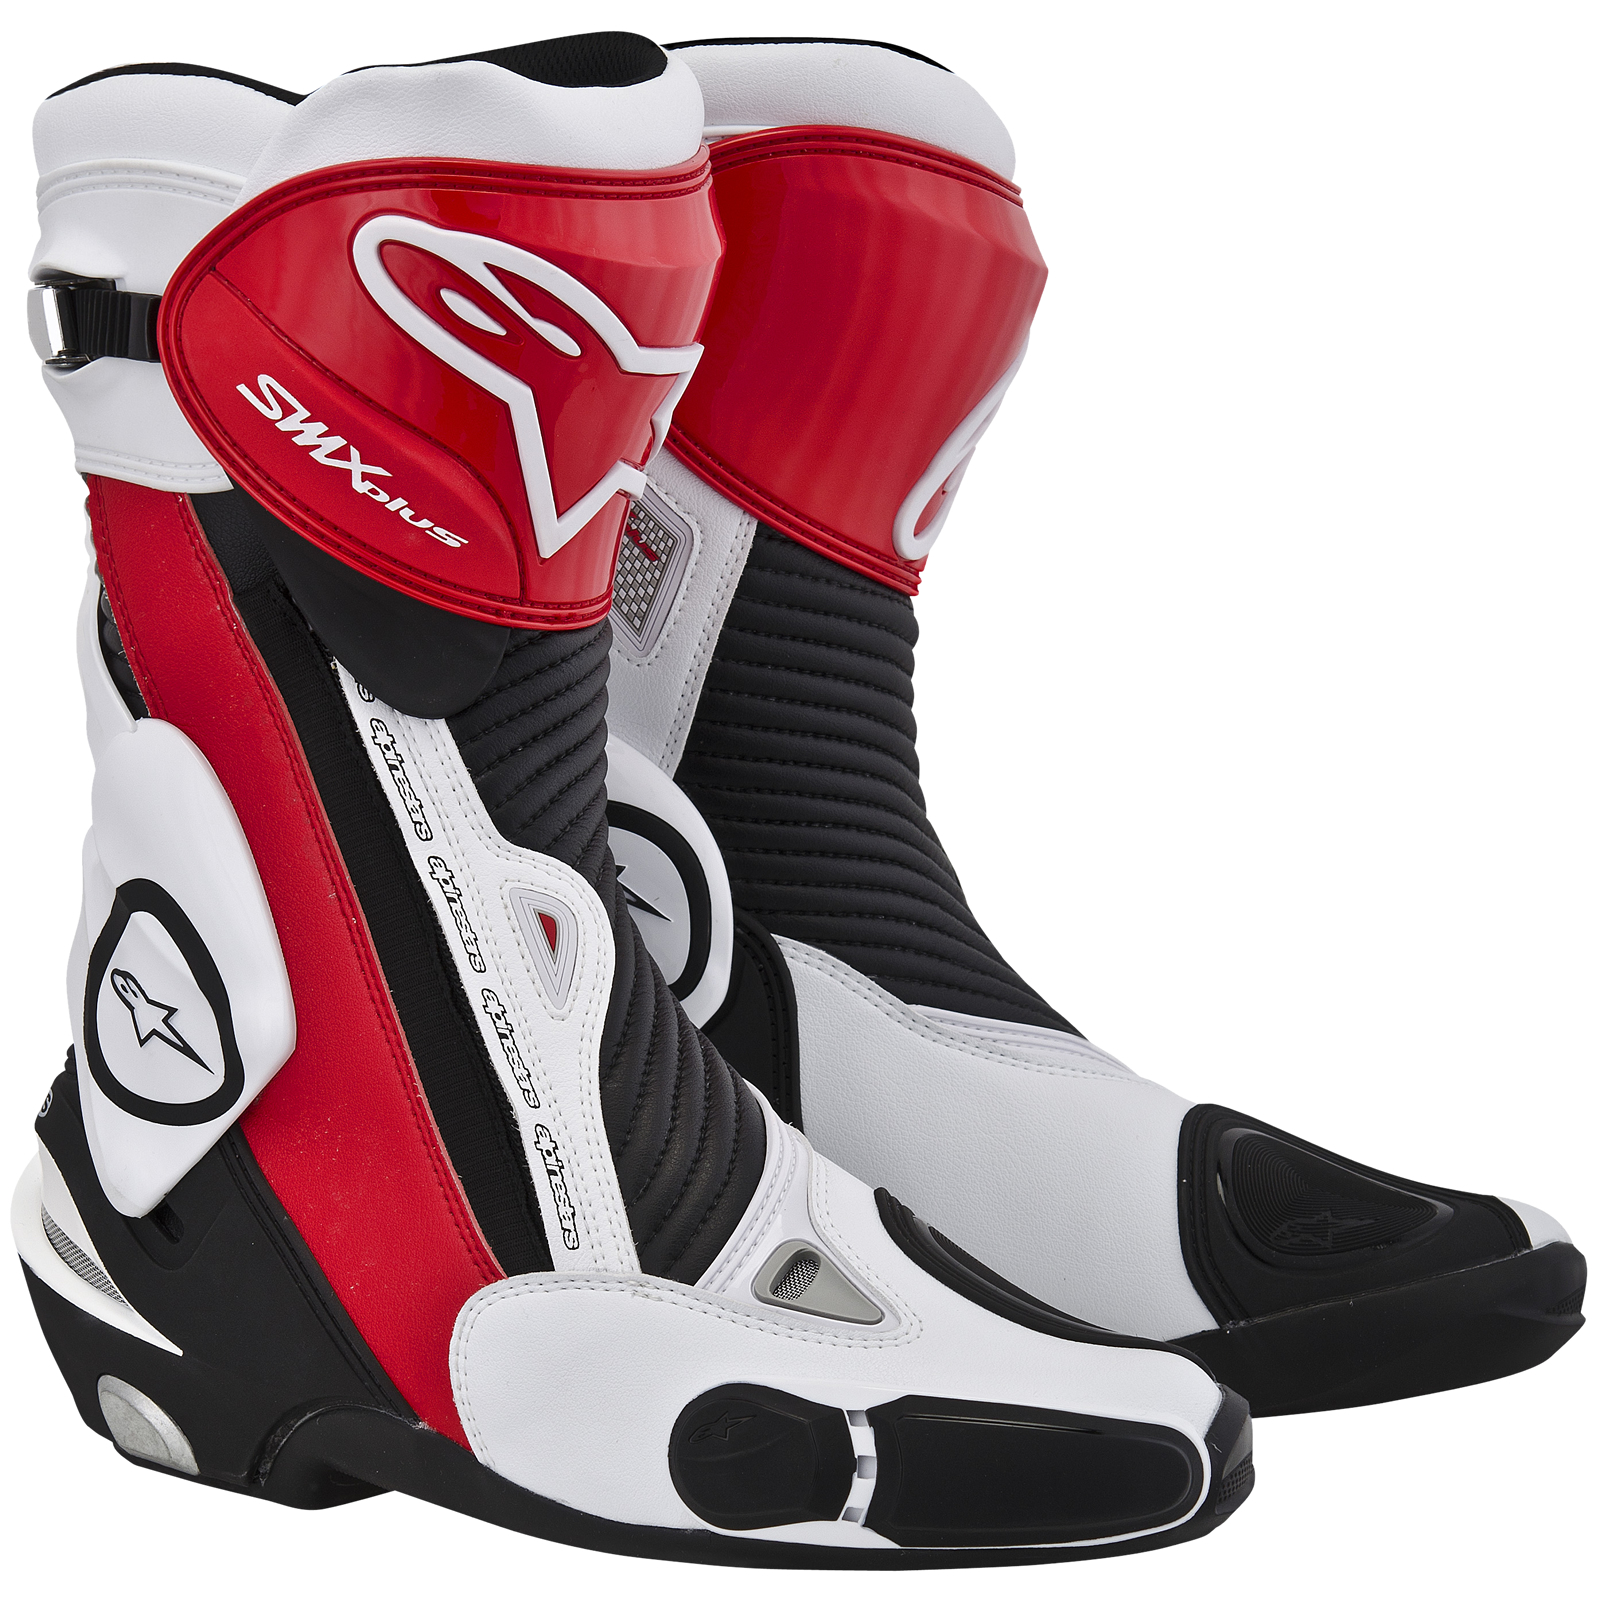 alpinestars smx s mx plus 2013 motorcycle racing motorbike sports bike boots ebay. Black Bedroom Furniture Sets. Home Design Ideas